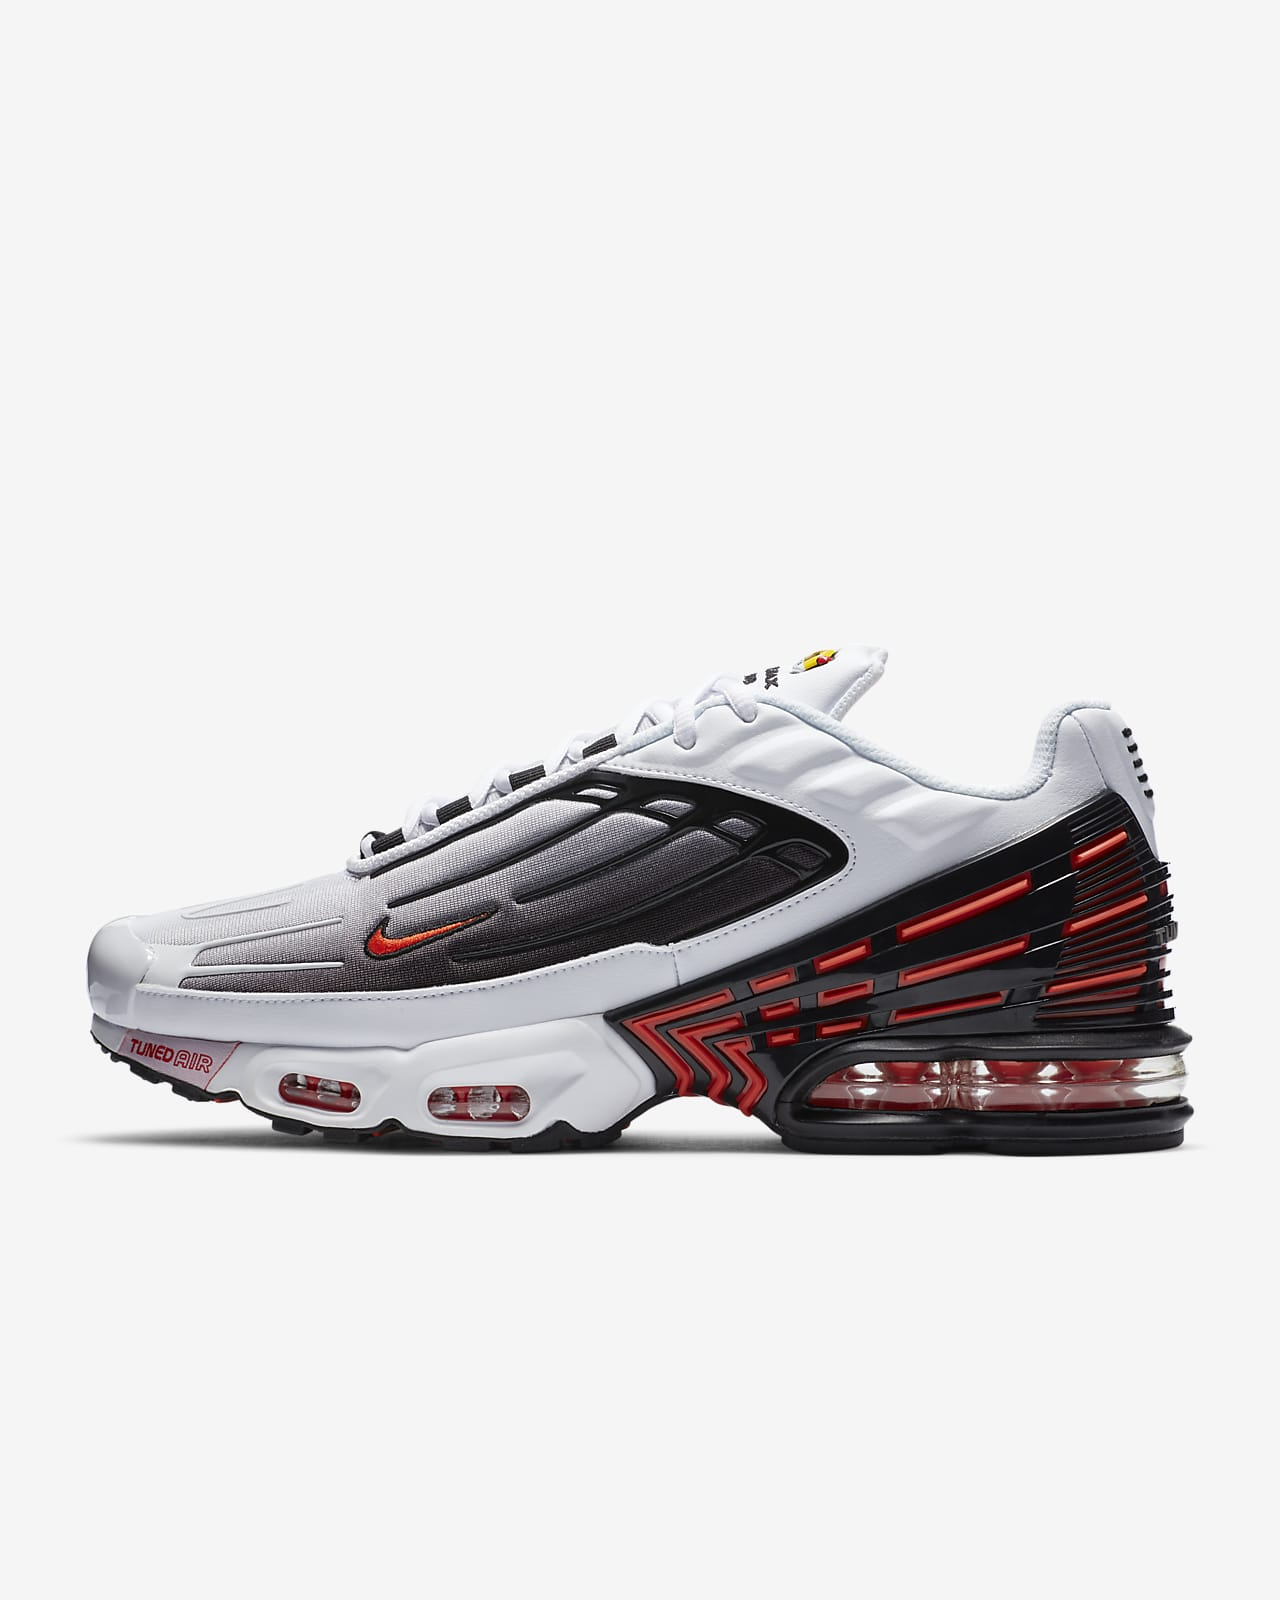 Nike Air Max Plus 3-sko til mænd